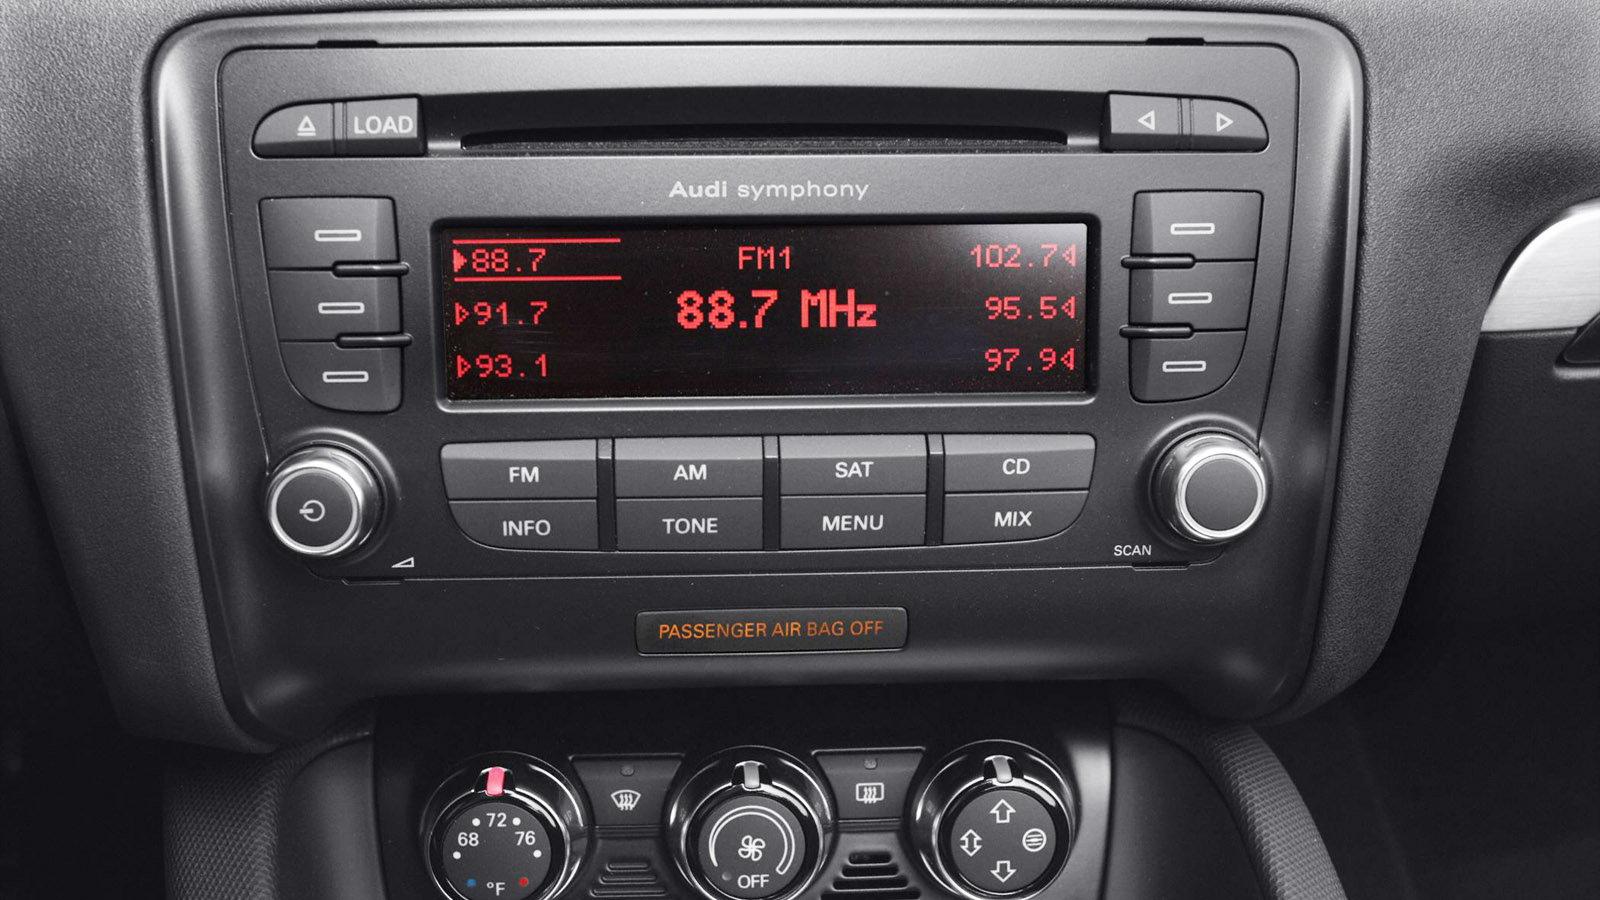 Audi Symphony 3 Radio Manual Integral Audio Mini Cooper Amplfier Speaker Wiring Harness R55 R56 R57 Concert Iii Array 7 Easter Eggs And Hidden Features Audiworld Rh Com